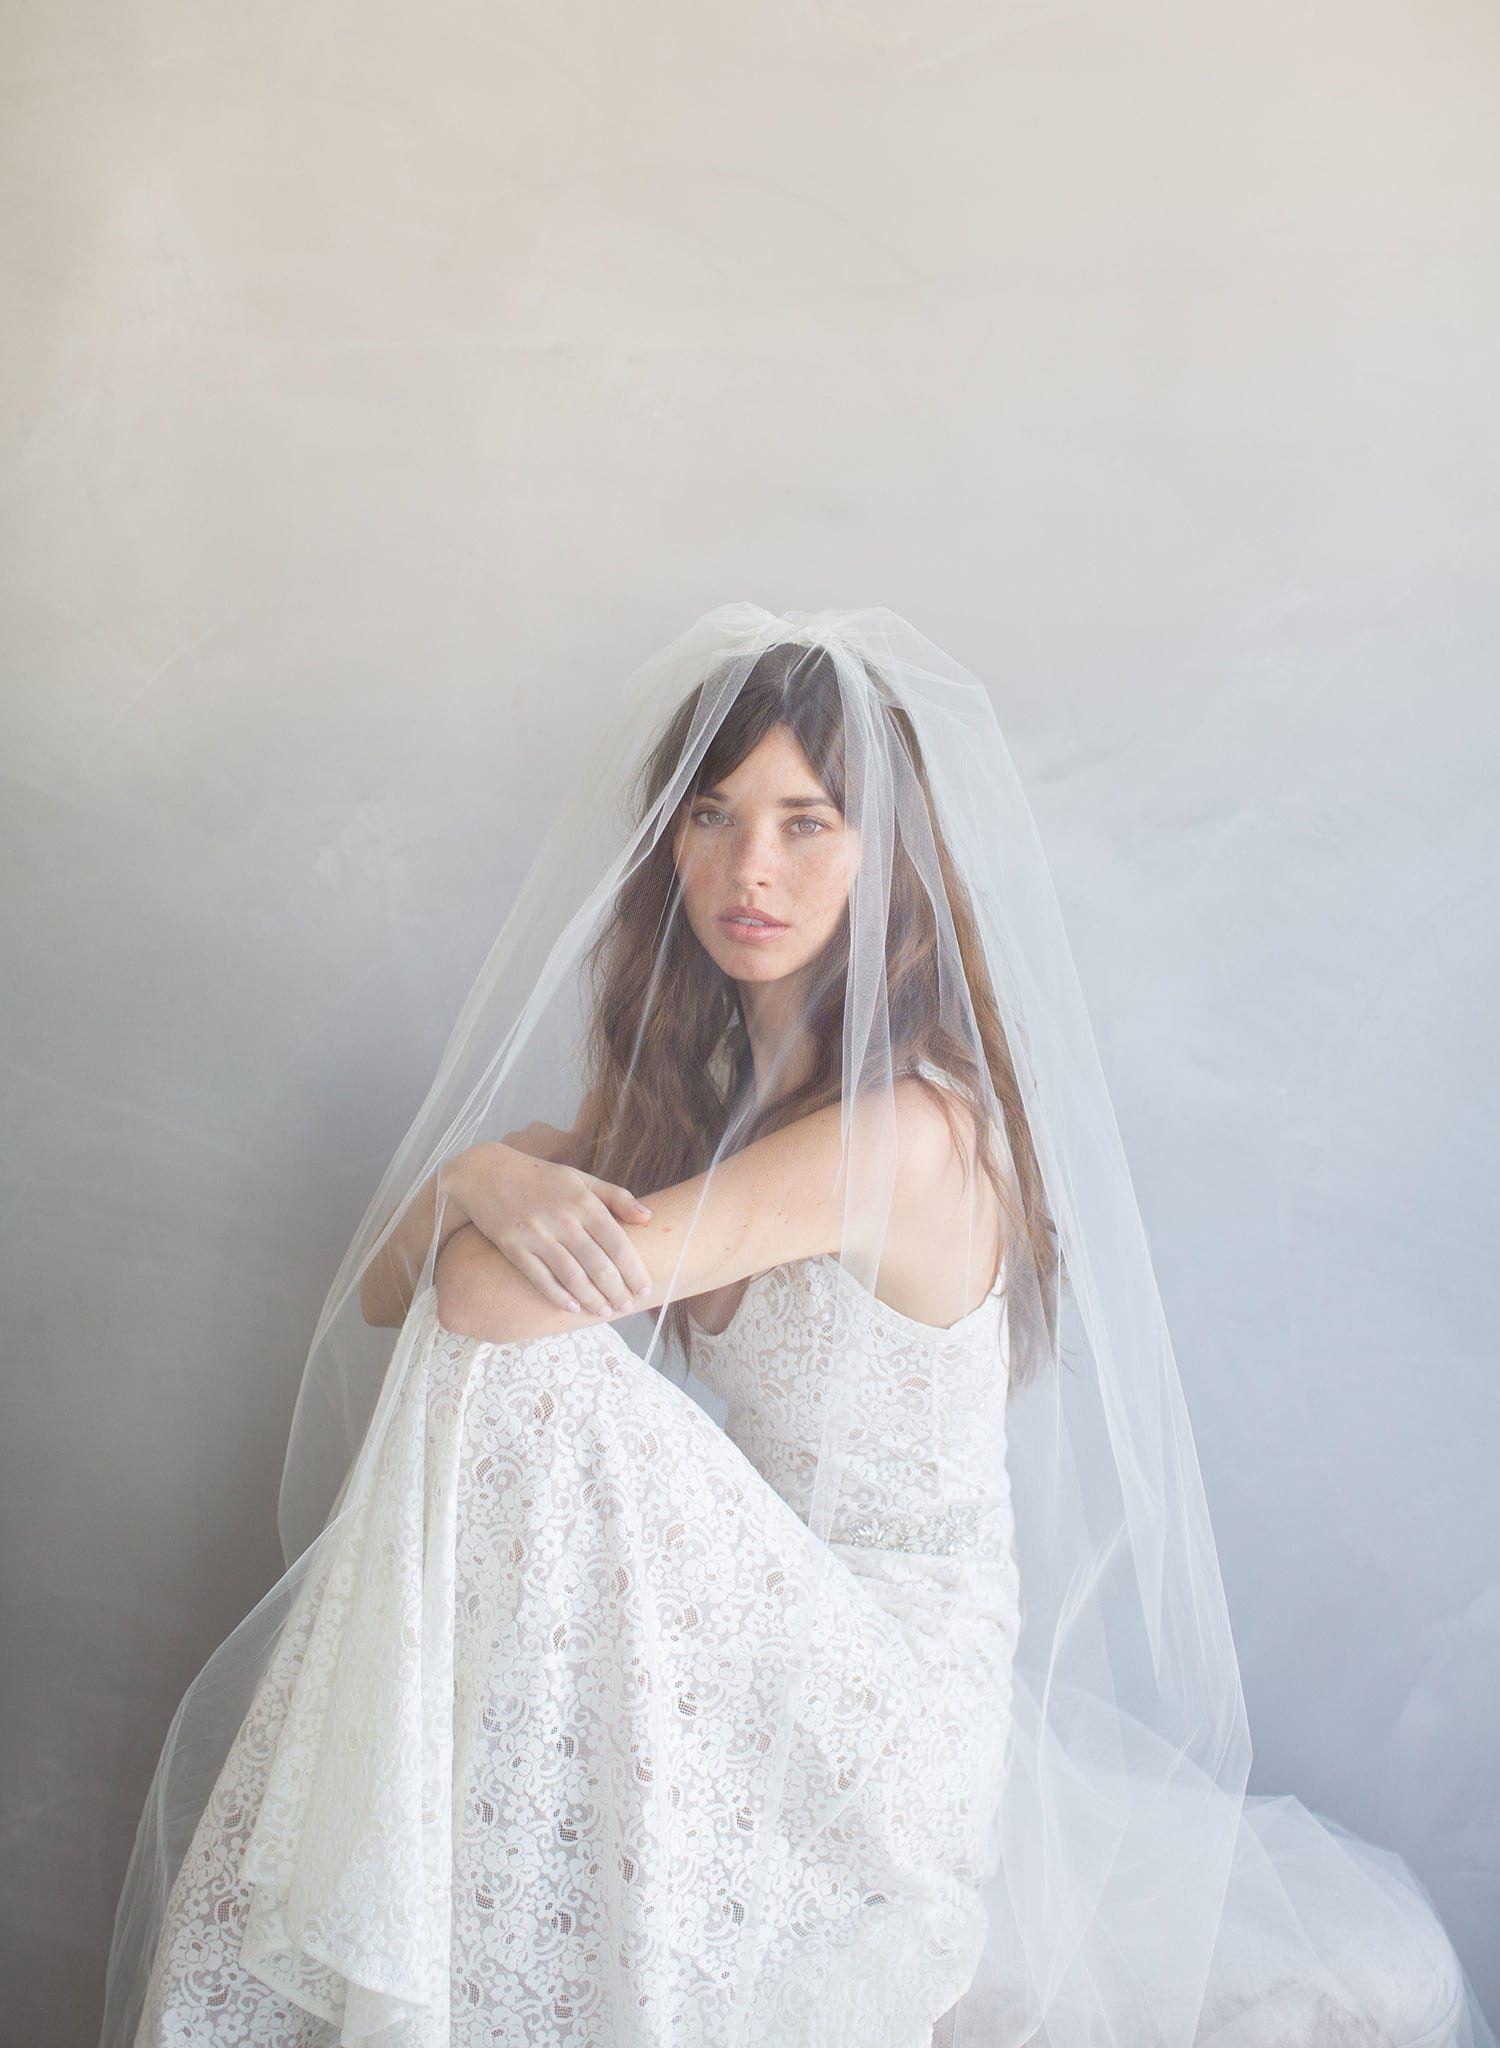 Bridal veil 2 piece simple gathered veil style 786